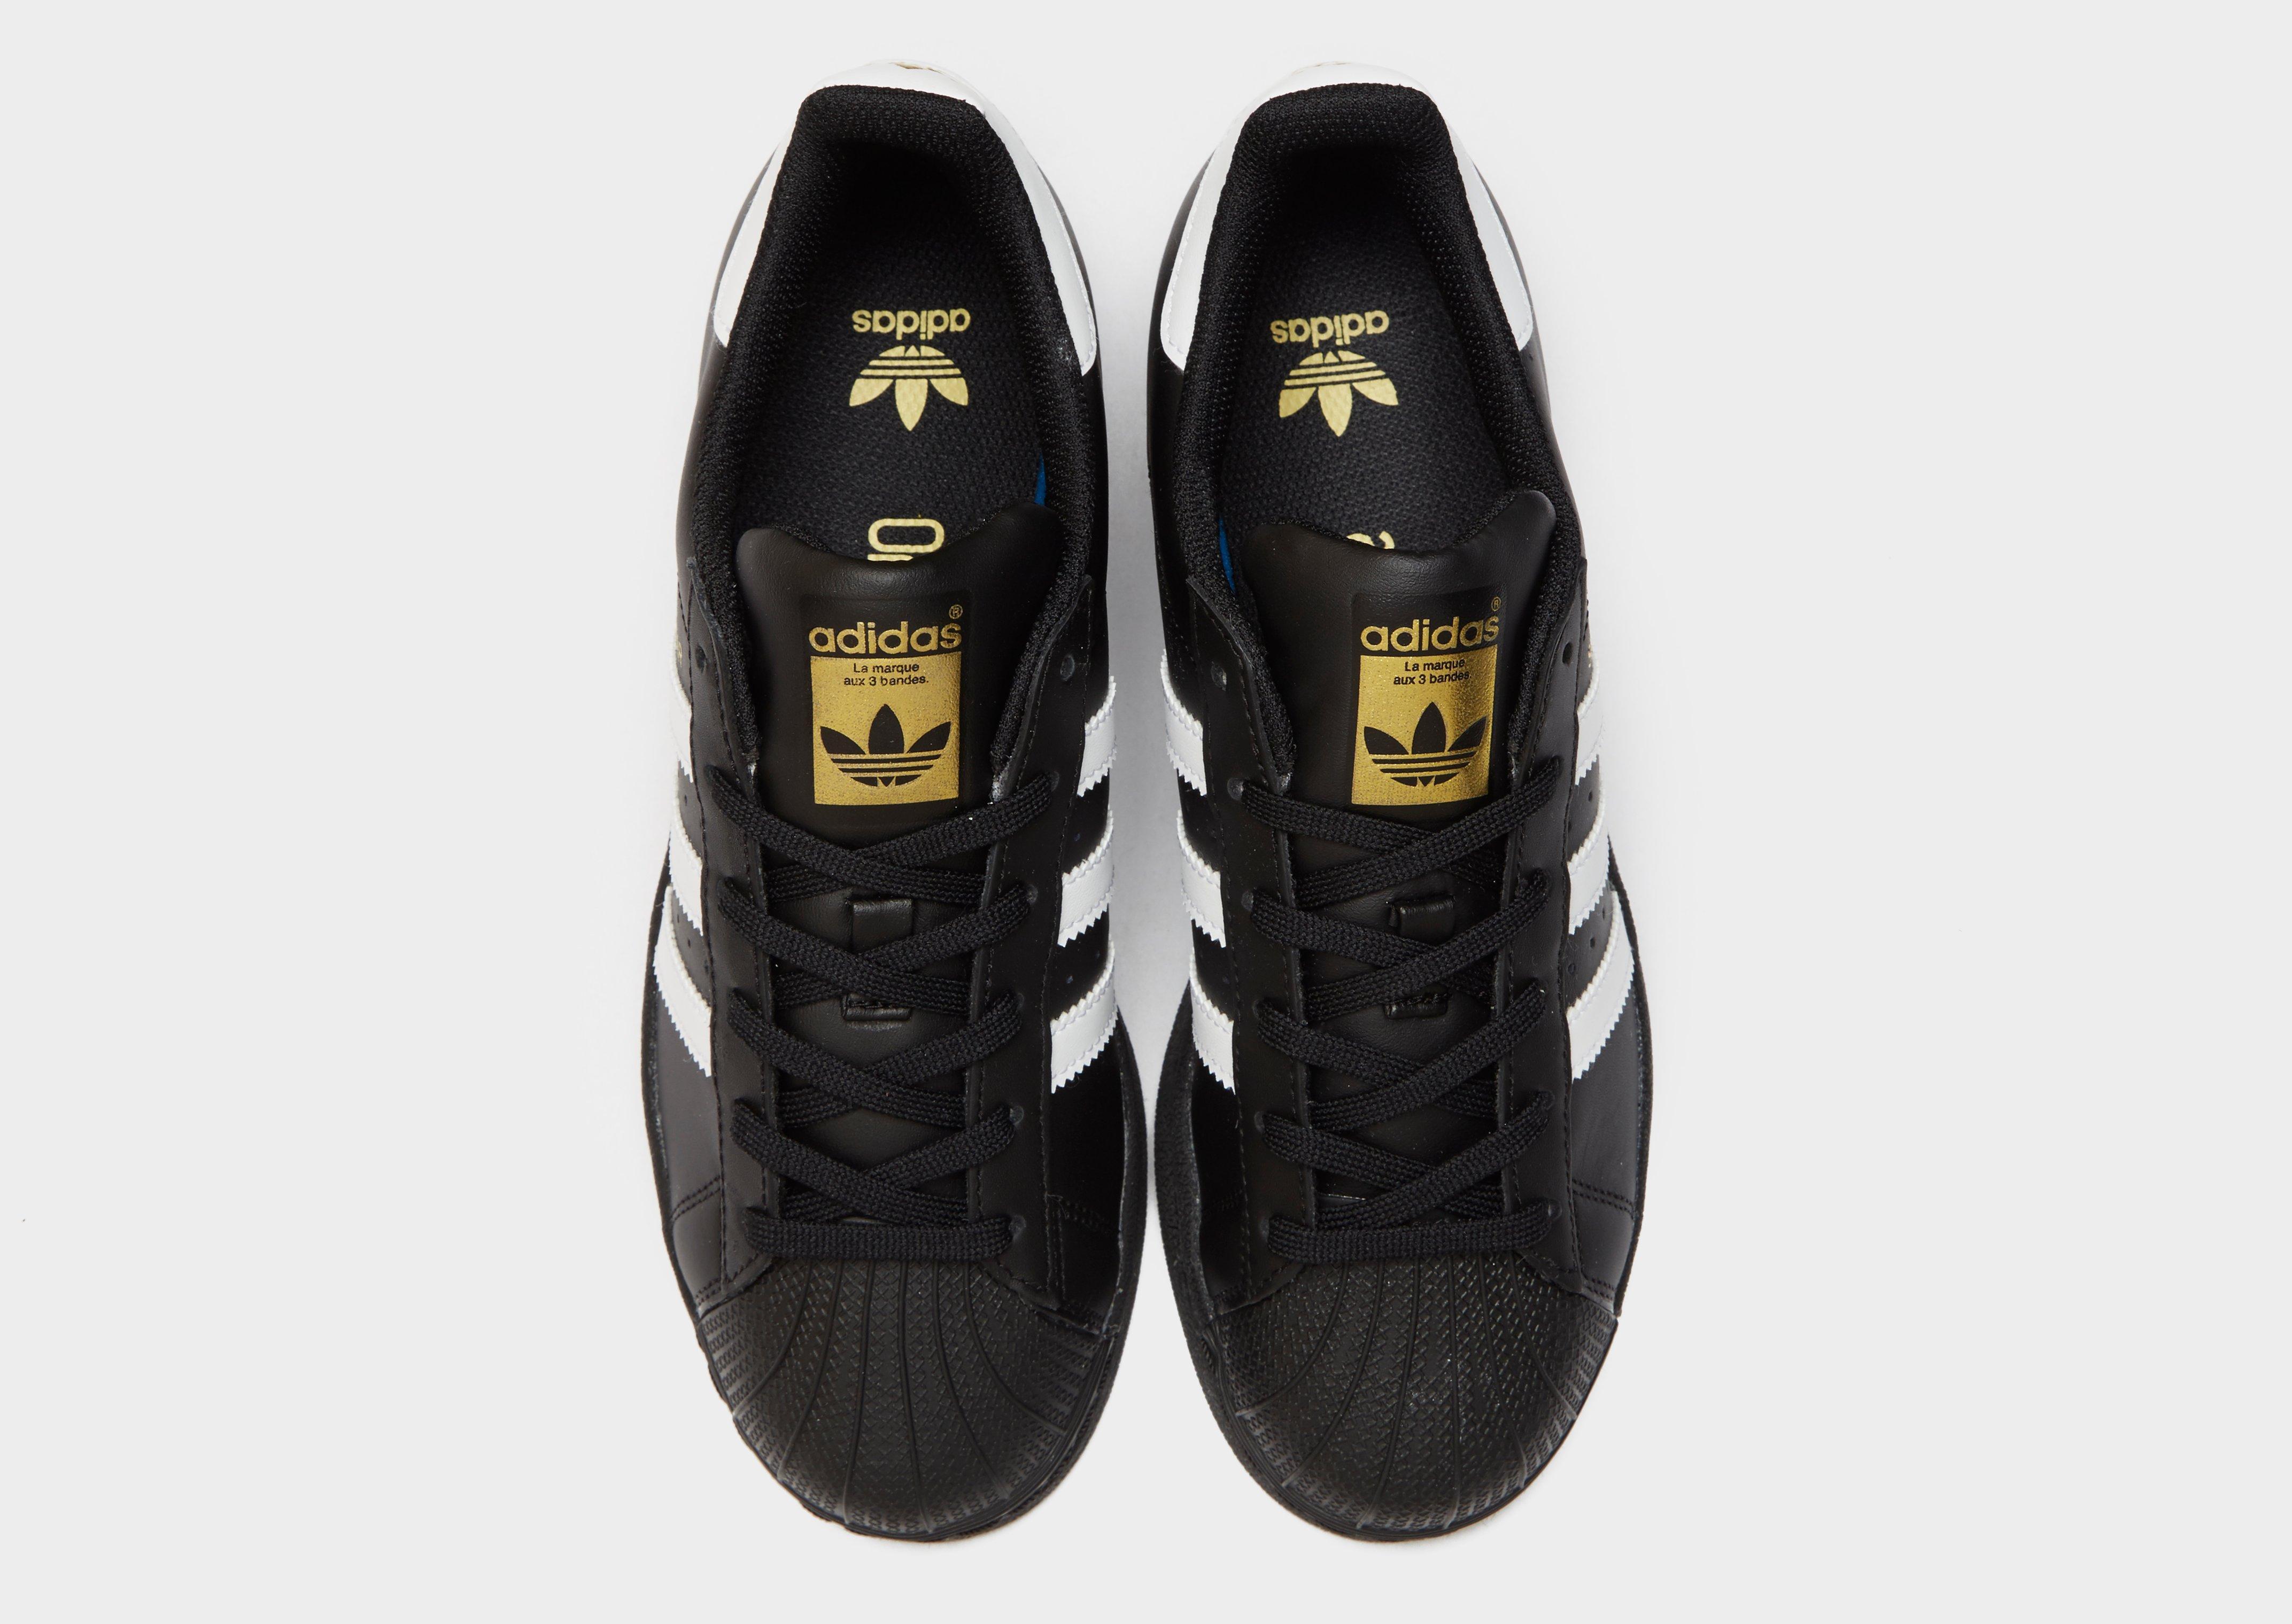 buty adidas zx 8000 legend ink